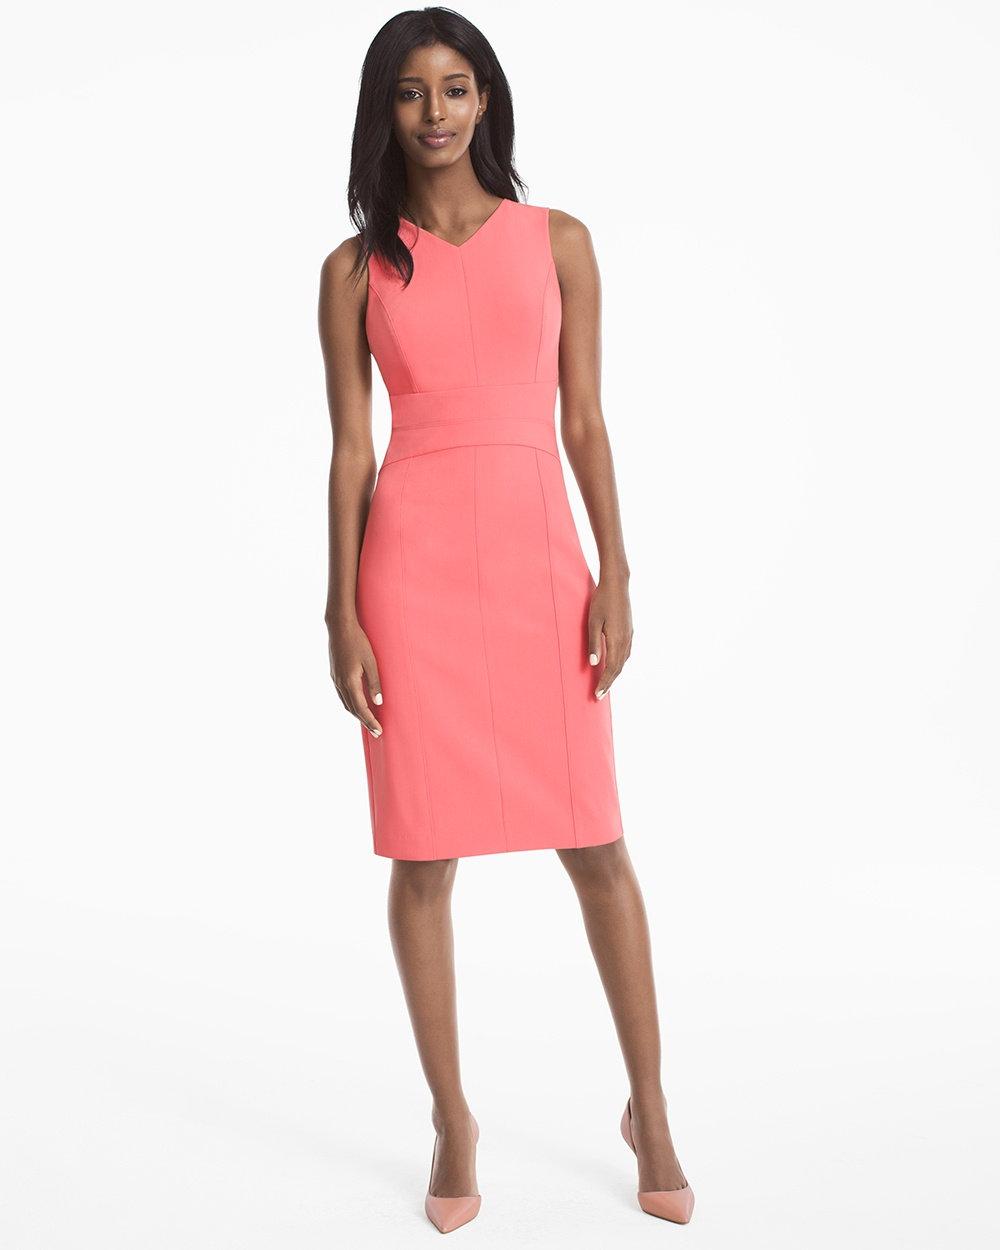 $69 - WHBM Seamed Sheath Dress